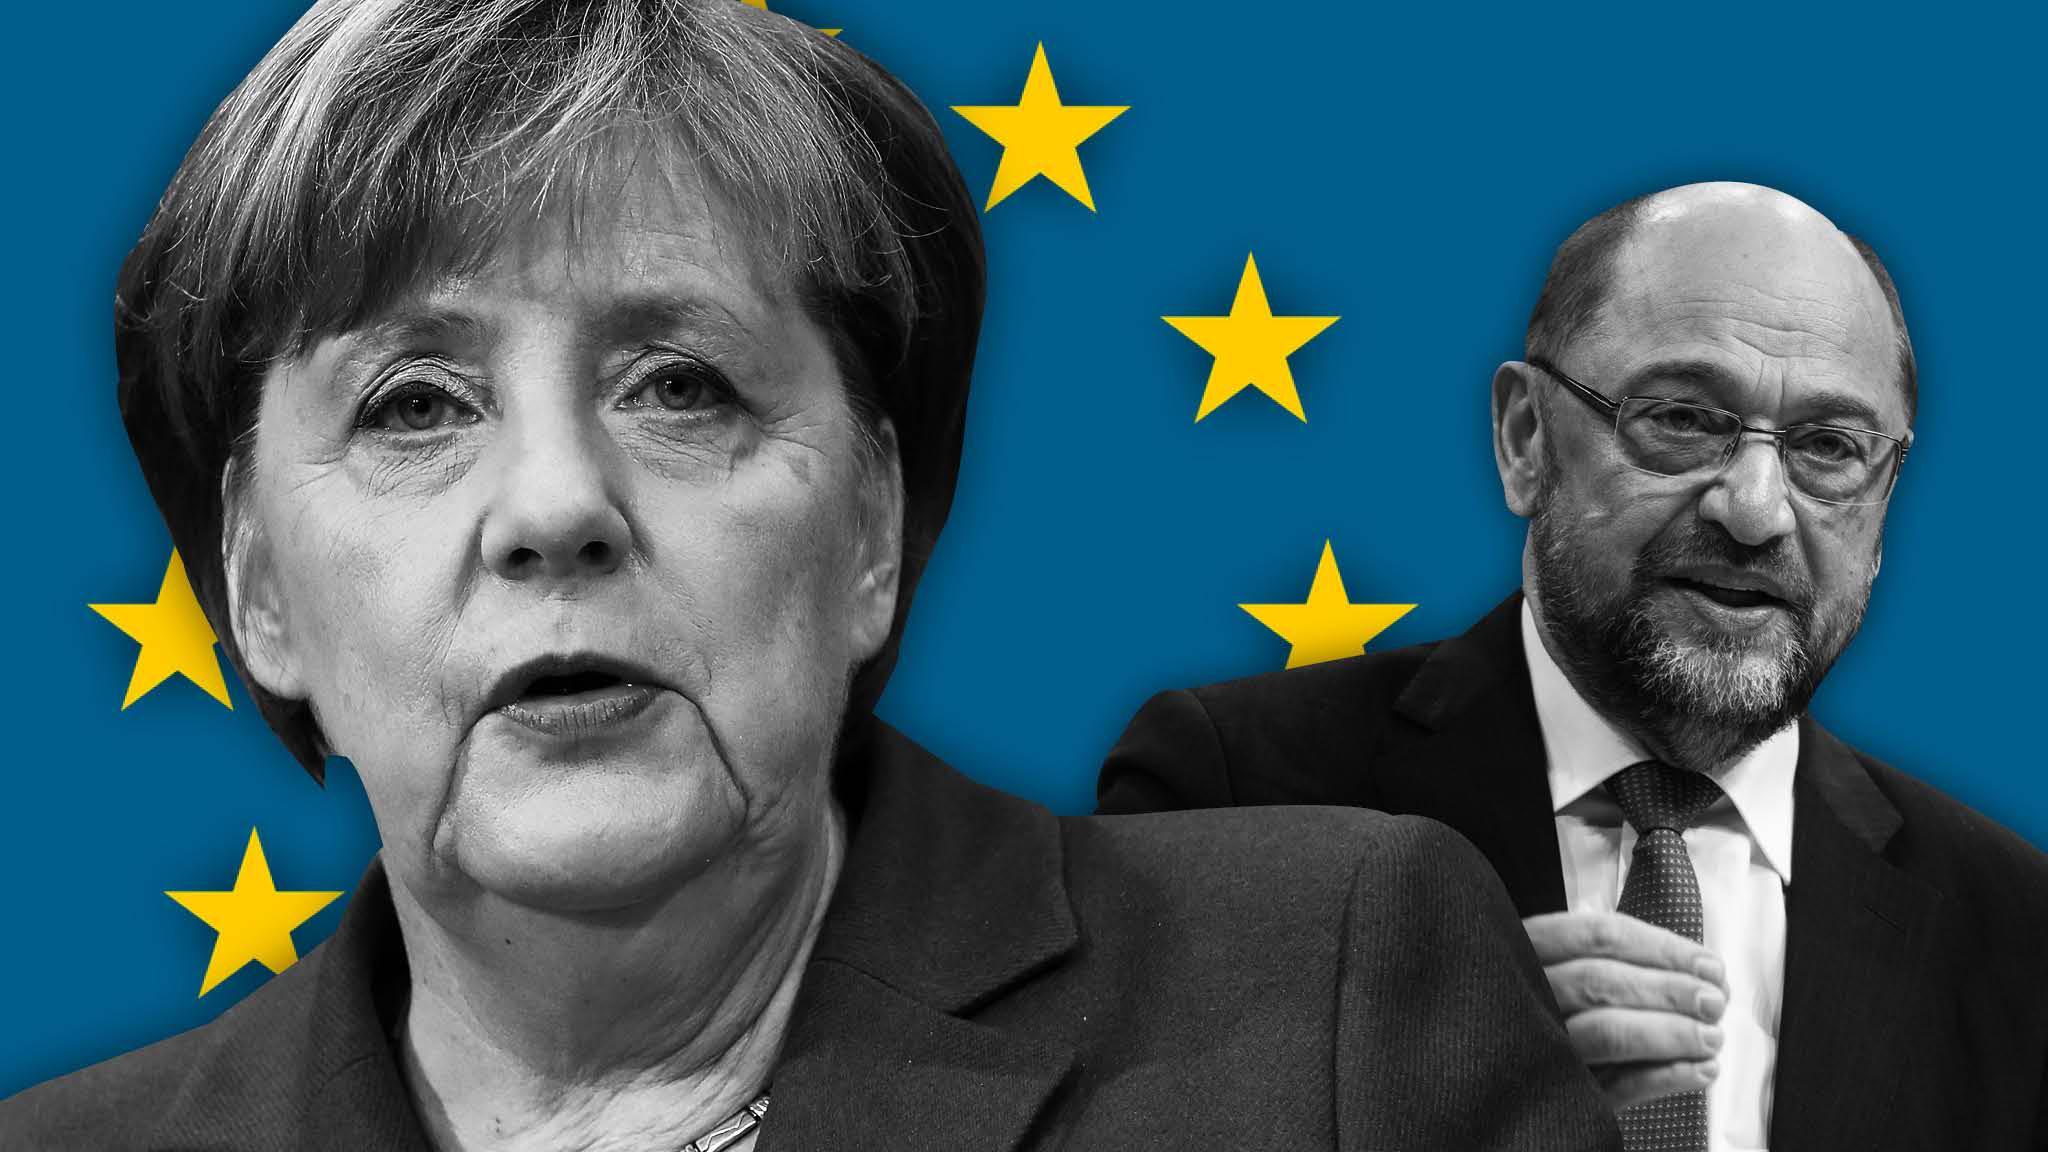 Berlin political deadlock stymies Macron's eurozone plans